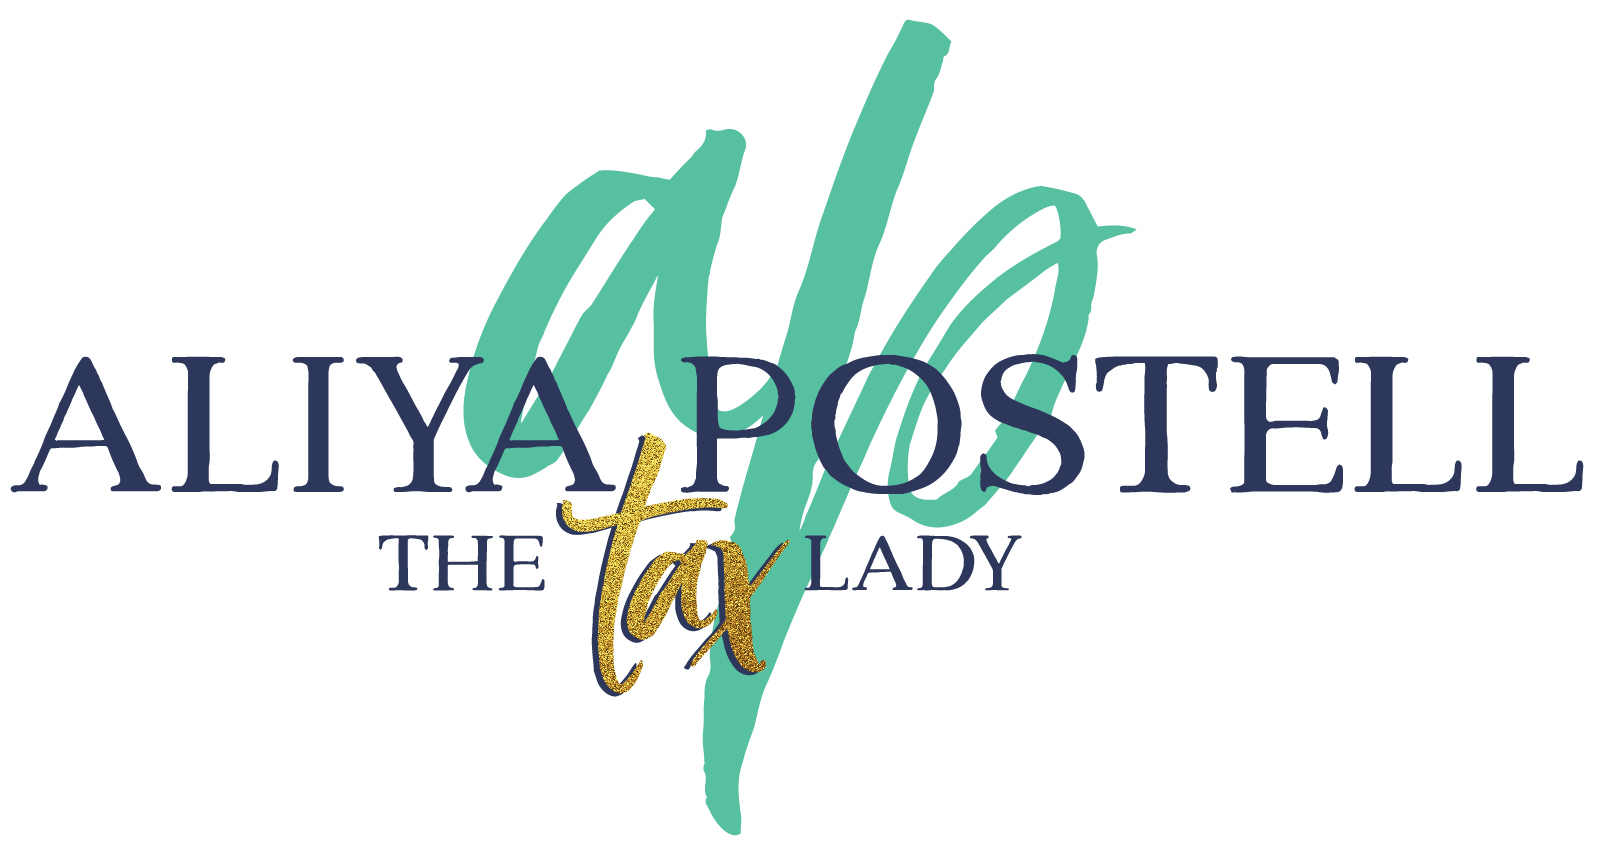 AP The Tax Lady